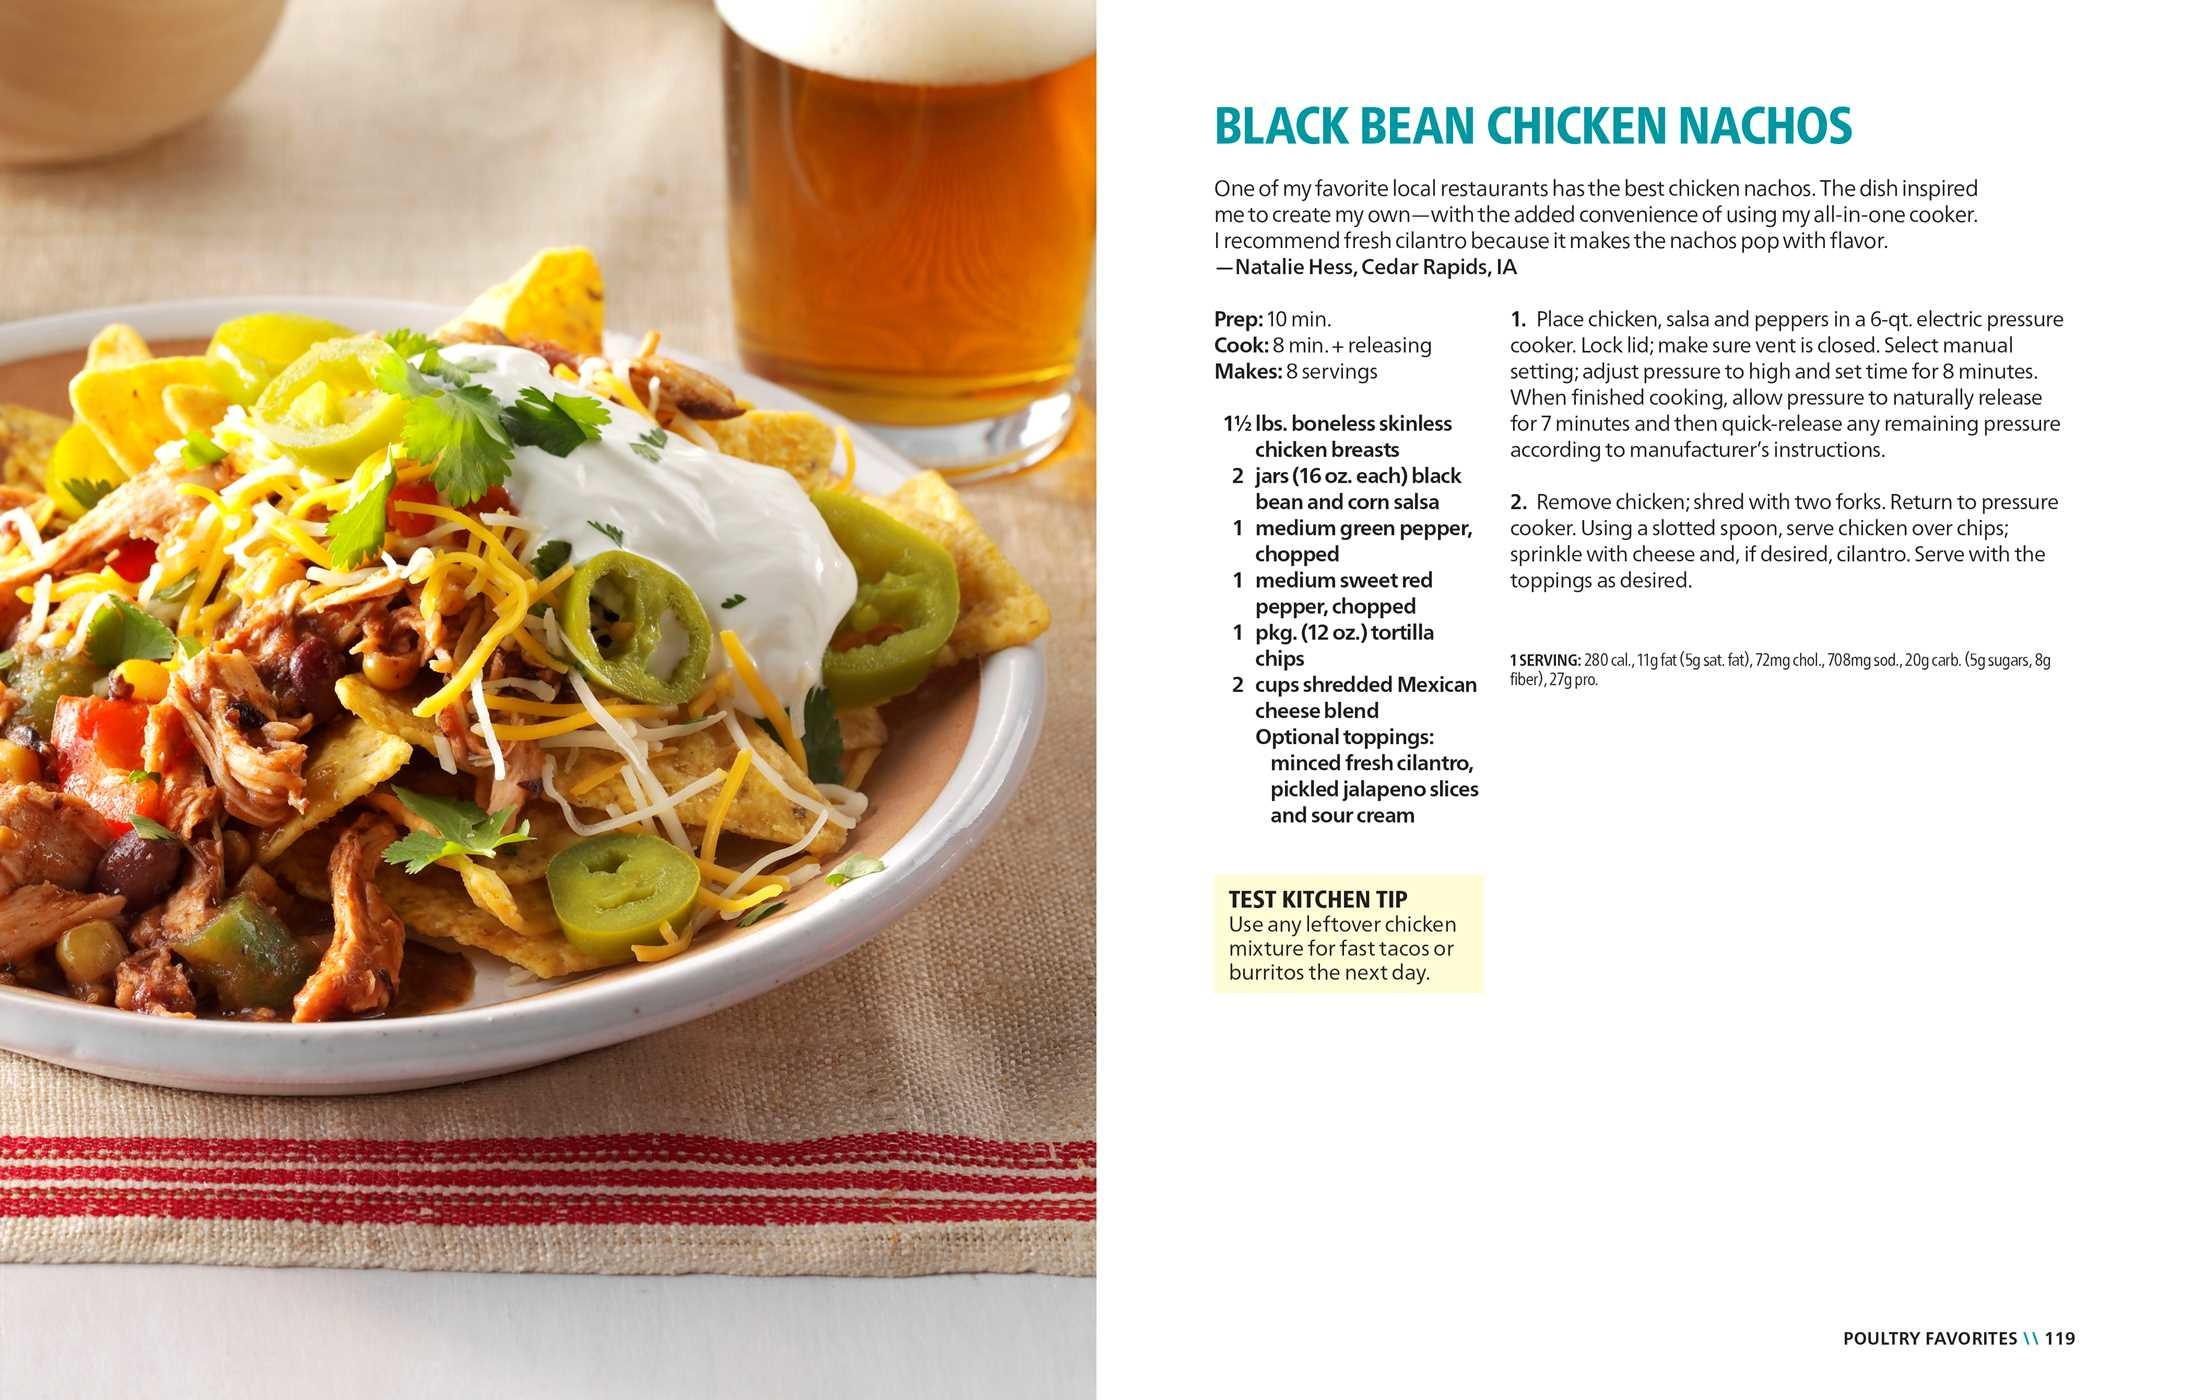 Taste of home instant pot cookbook 9781617657665.in07